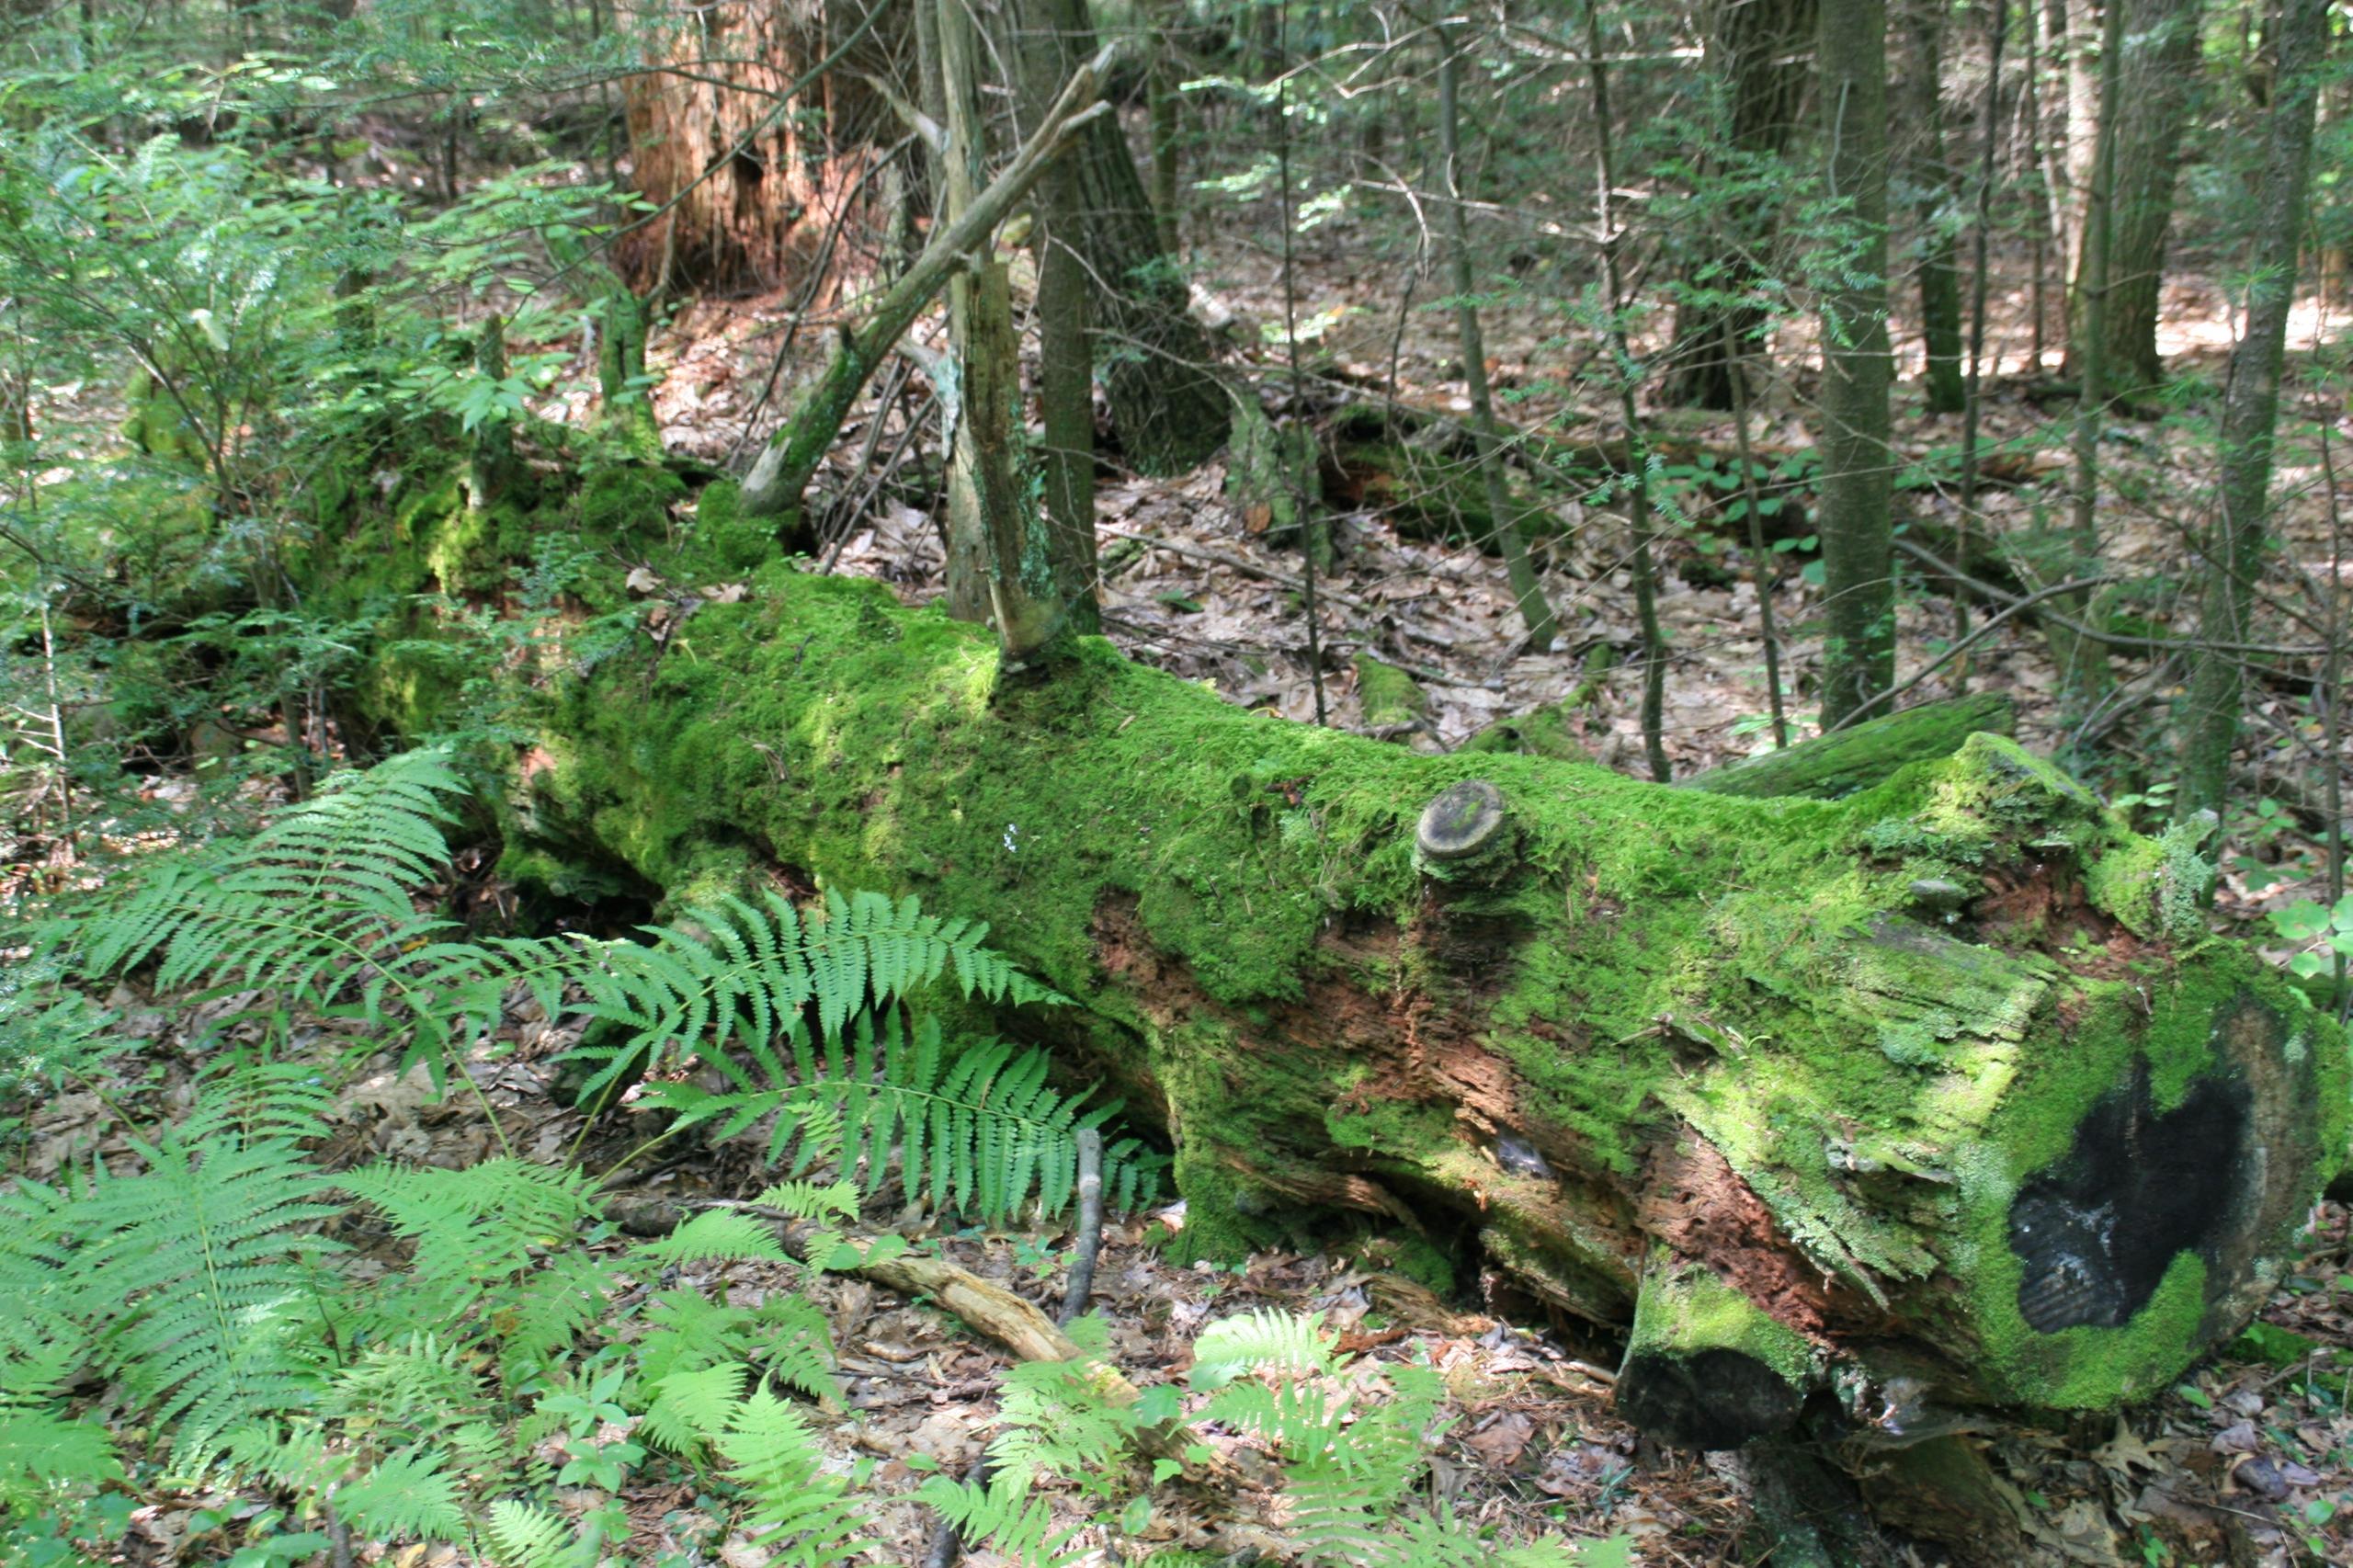 rolling stone collects moss, fe - segloch | ello